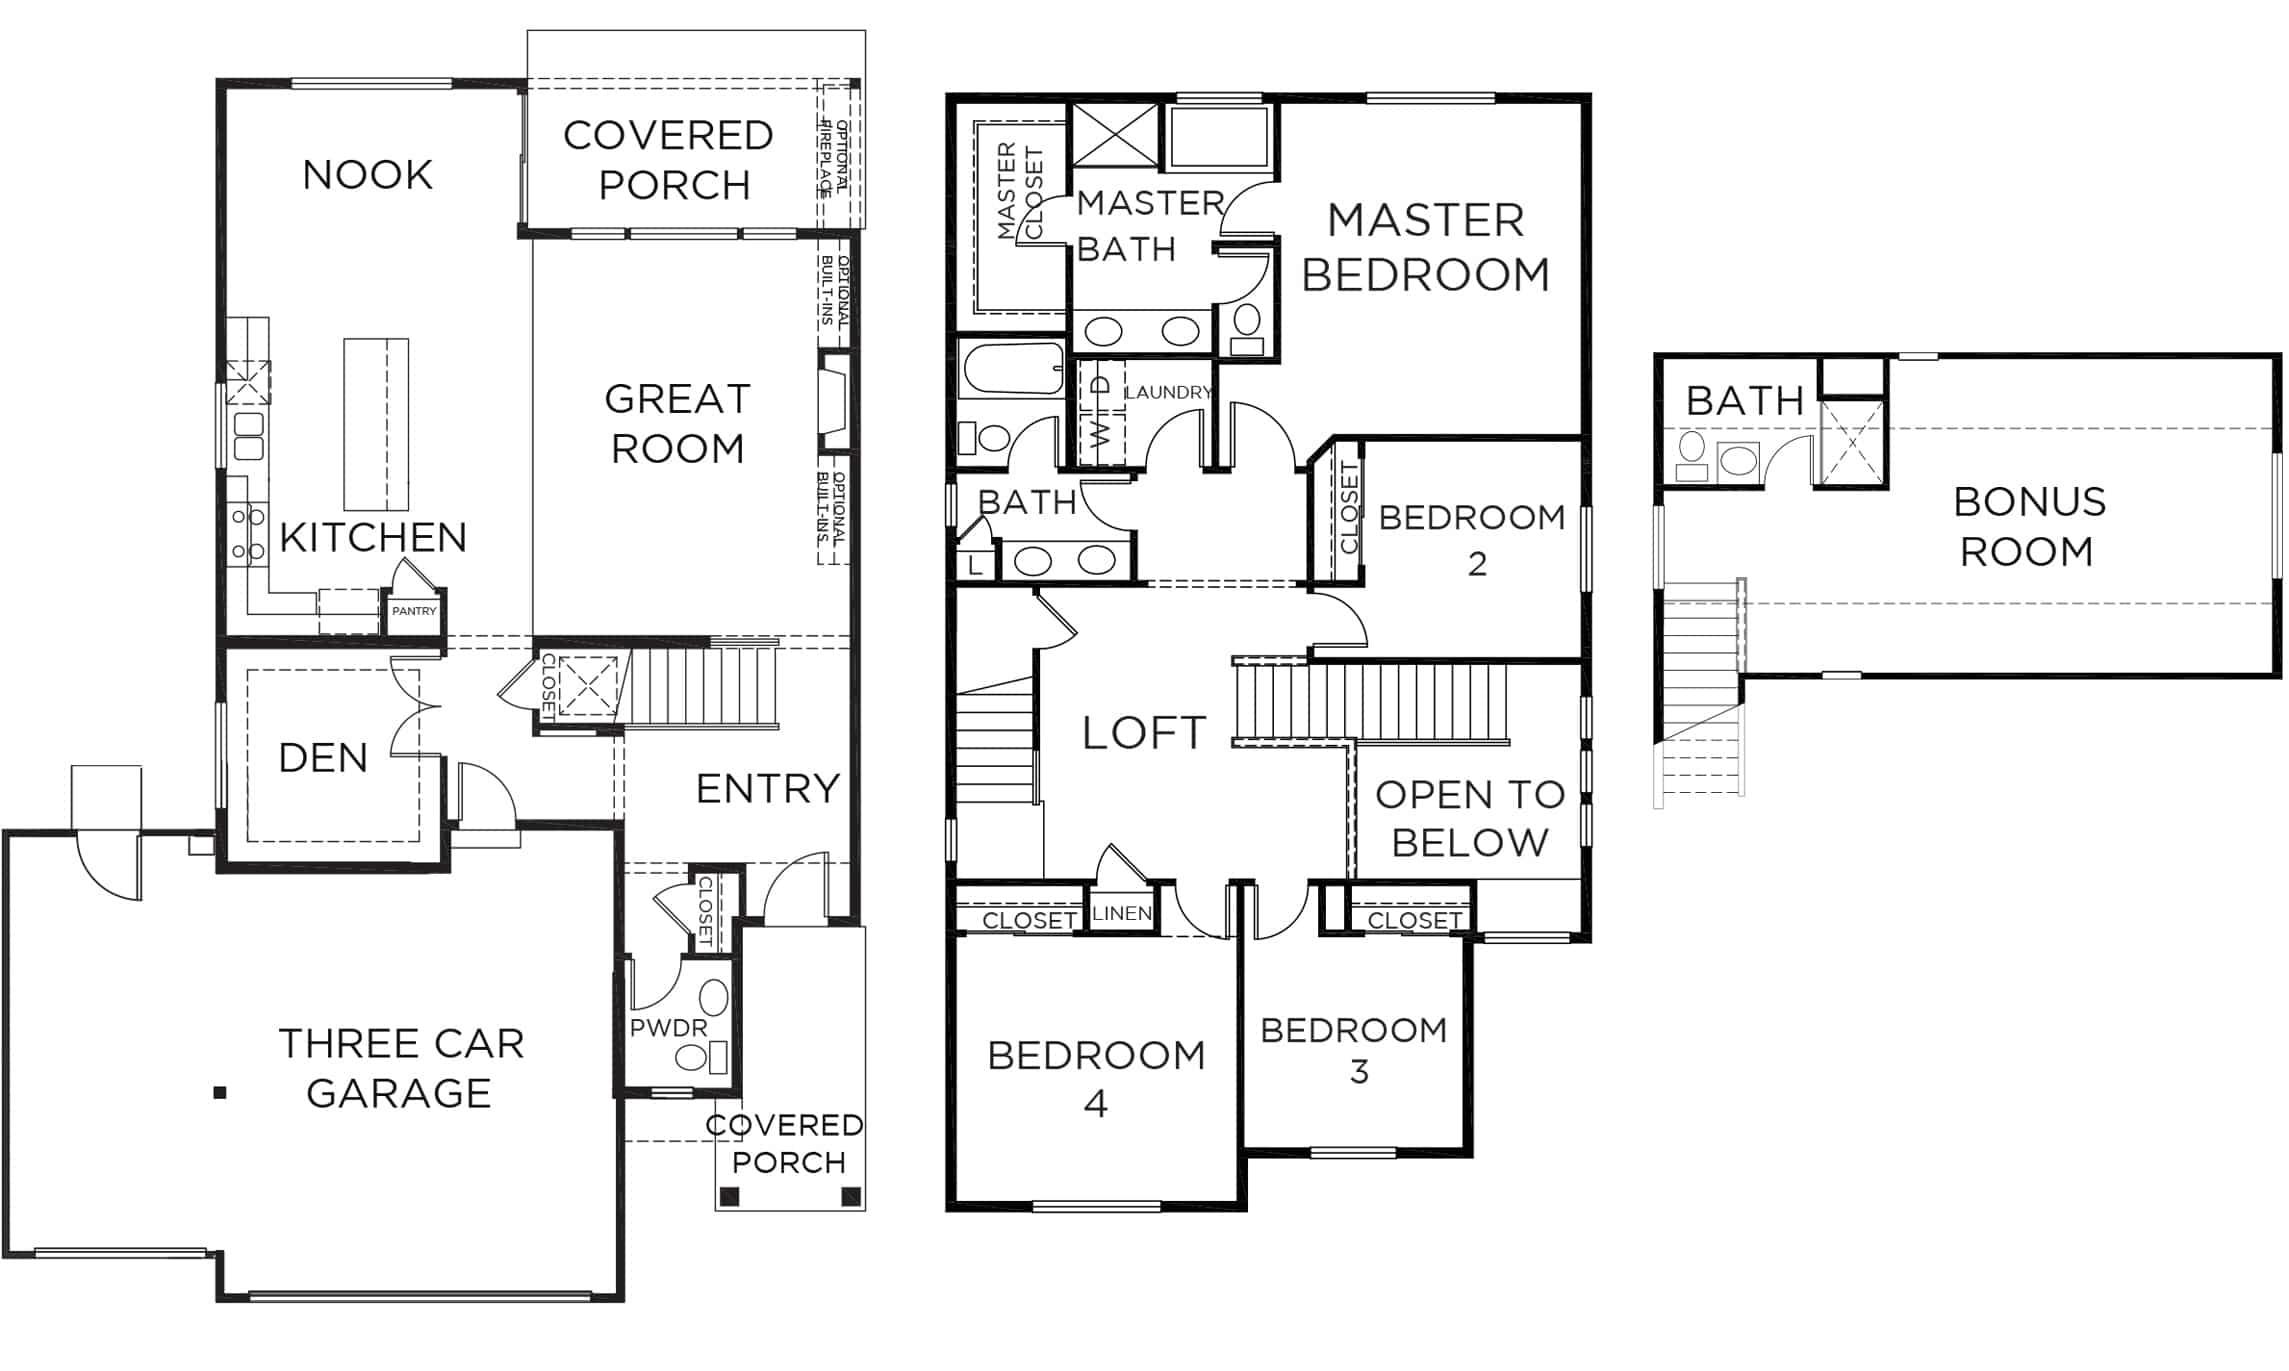 soundbuilt-willow-floorplan-2853-A3